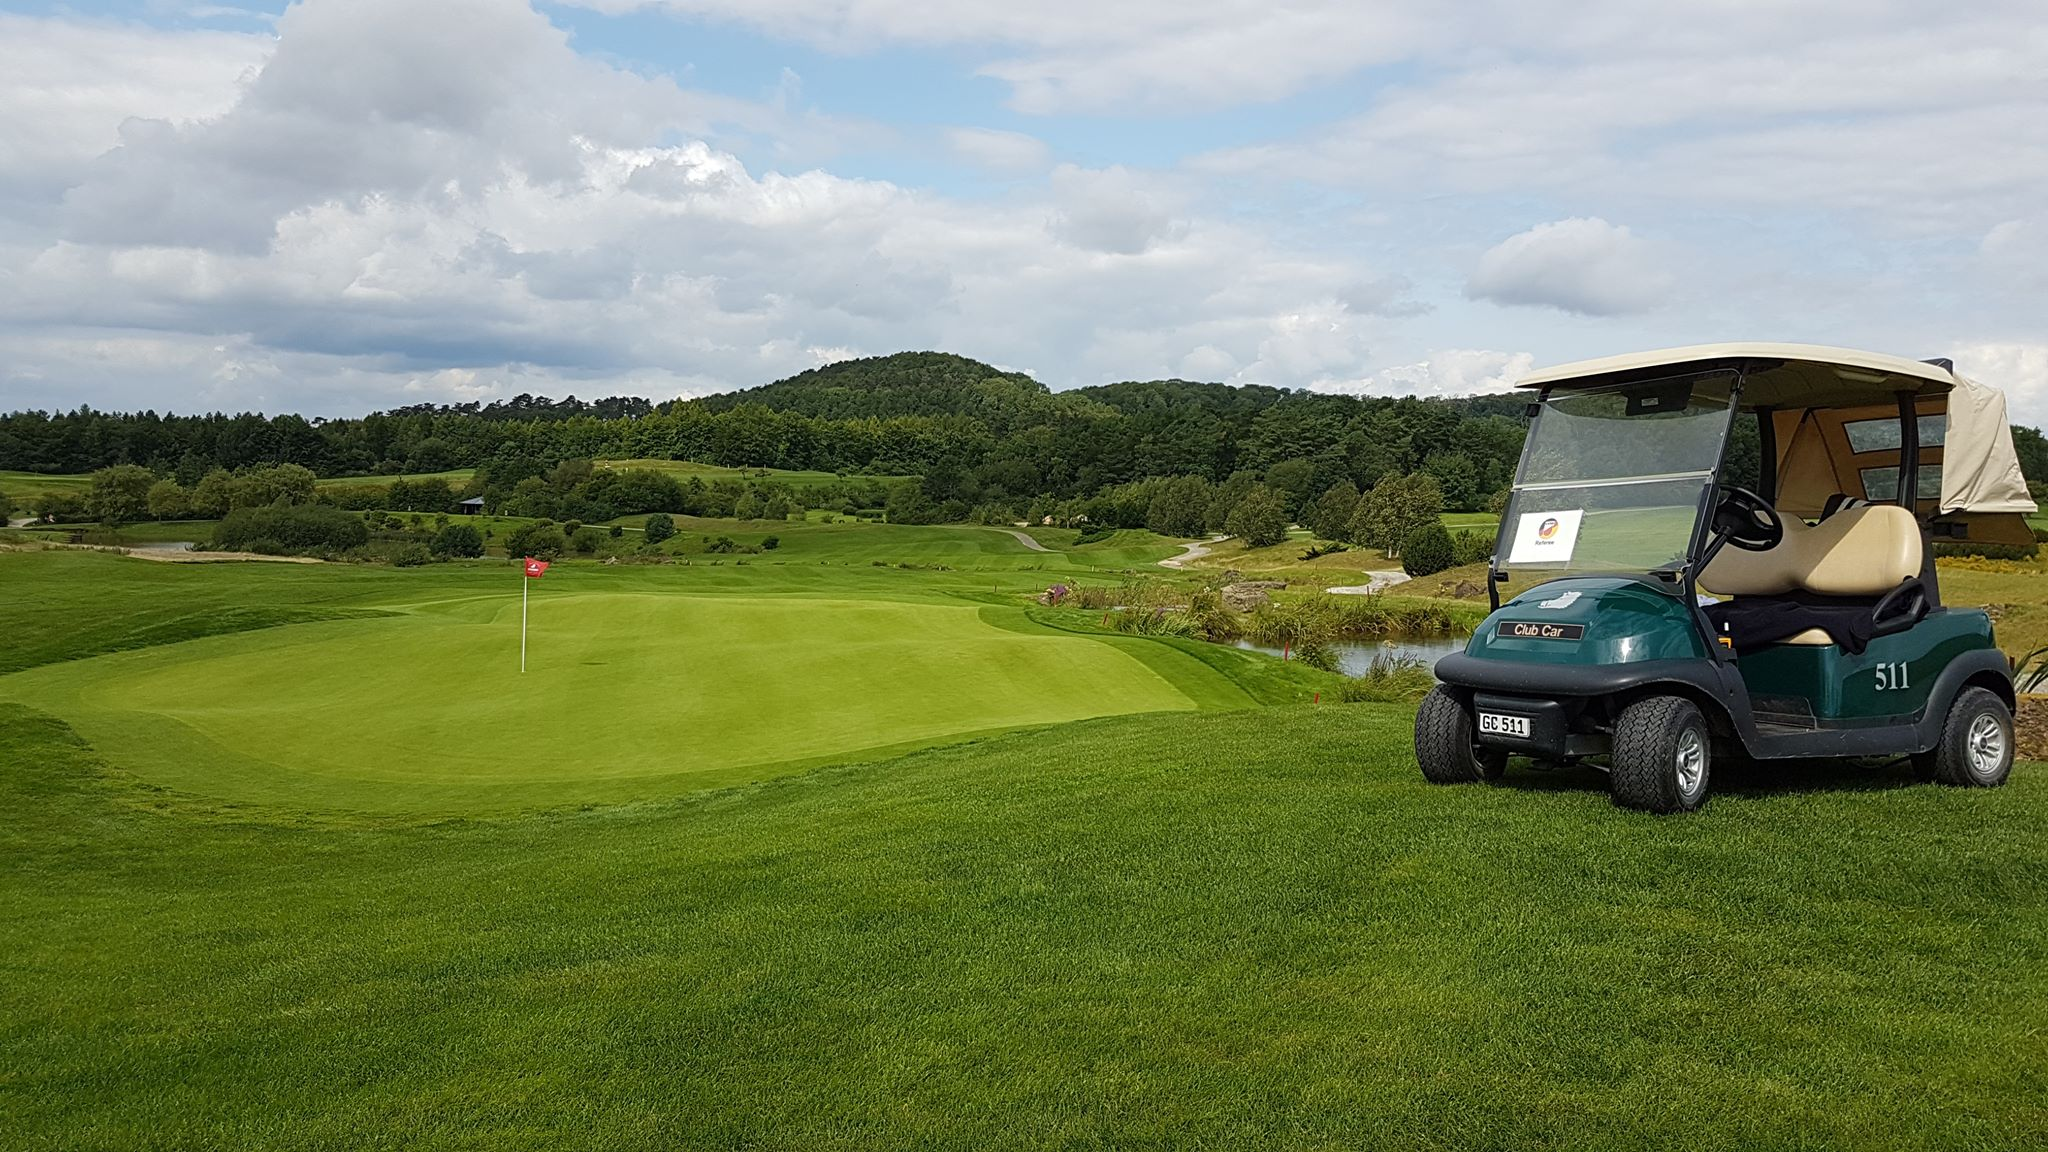 Golfregeln Entfernungsmesser : Golf rules! u2013 golfregeln. täglich. erklärt.